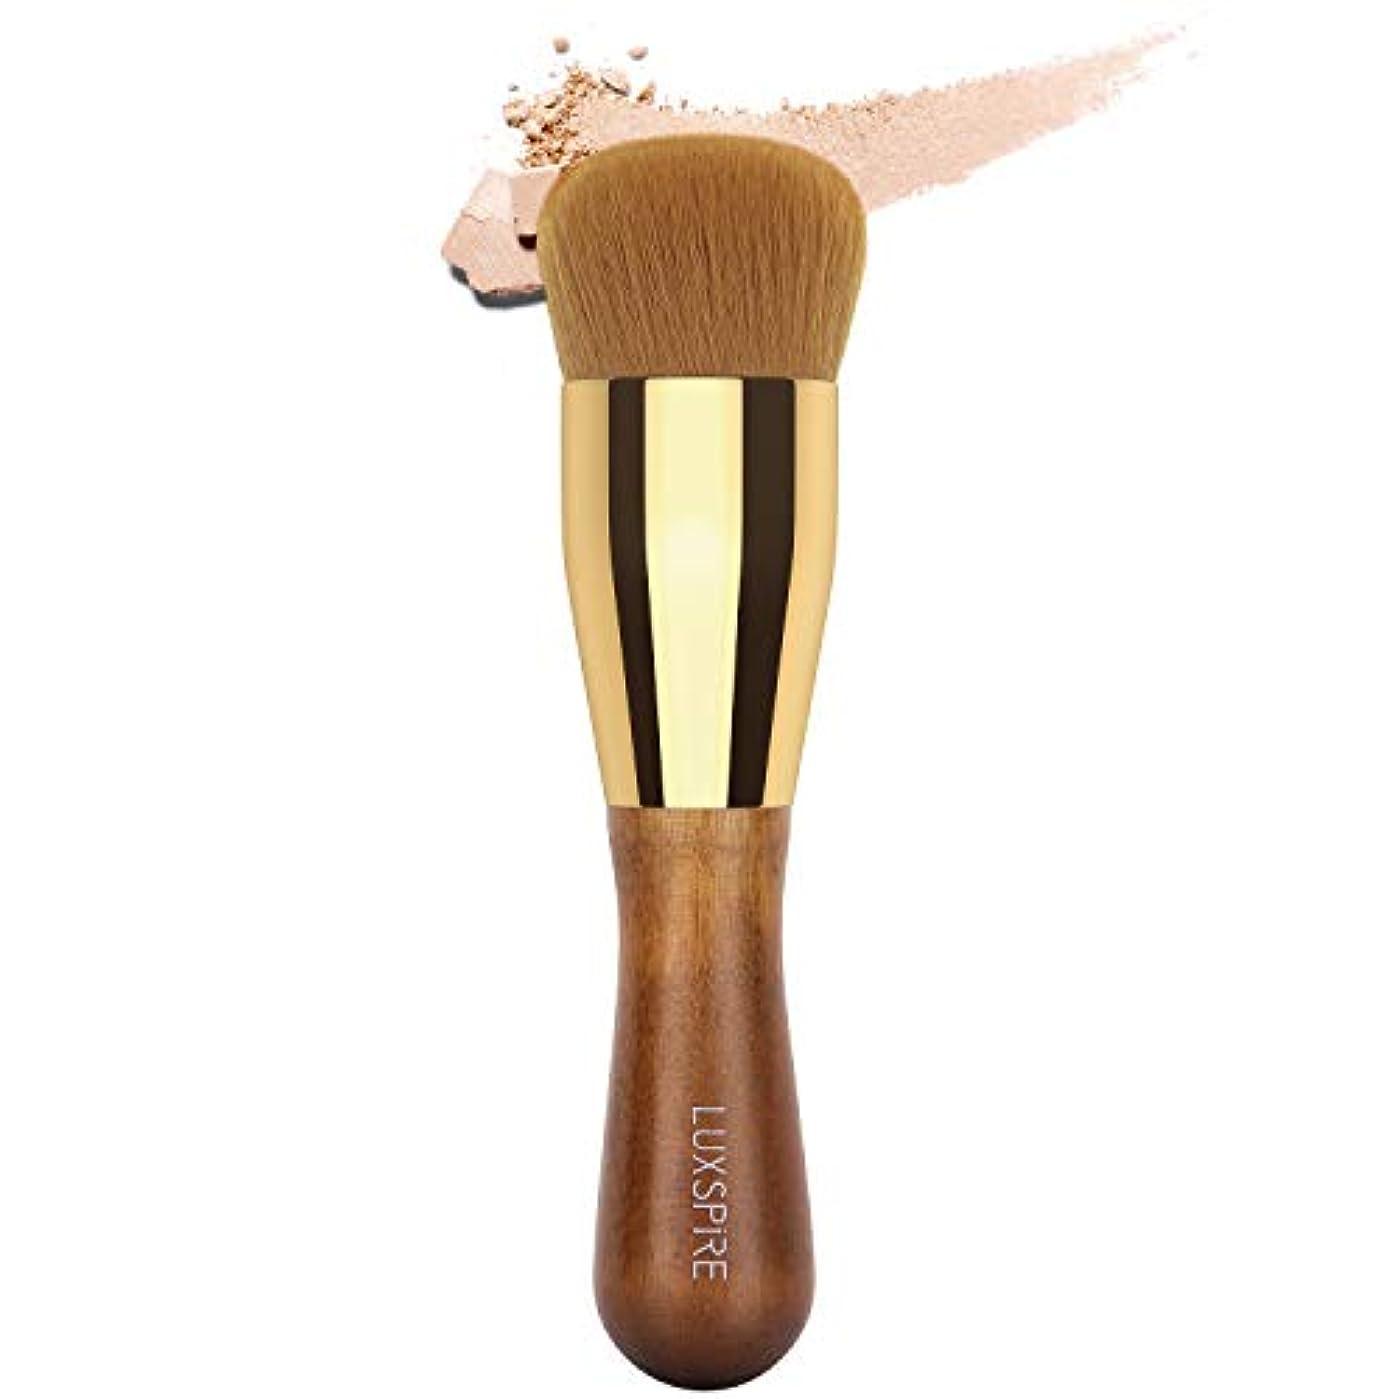 Luxspire メイクブラシ ファンデーションブラシ 化粧筆 木製ハンドル 繊維毛 旅行出張用 多機能 超柔らかい ふわふわ 肌色